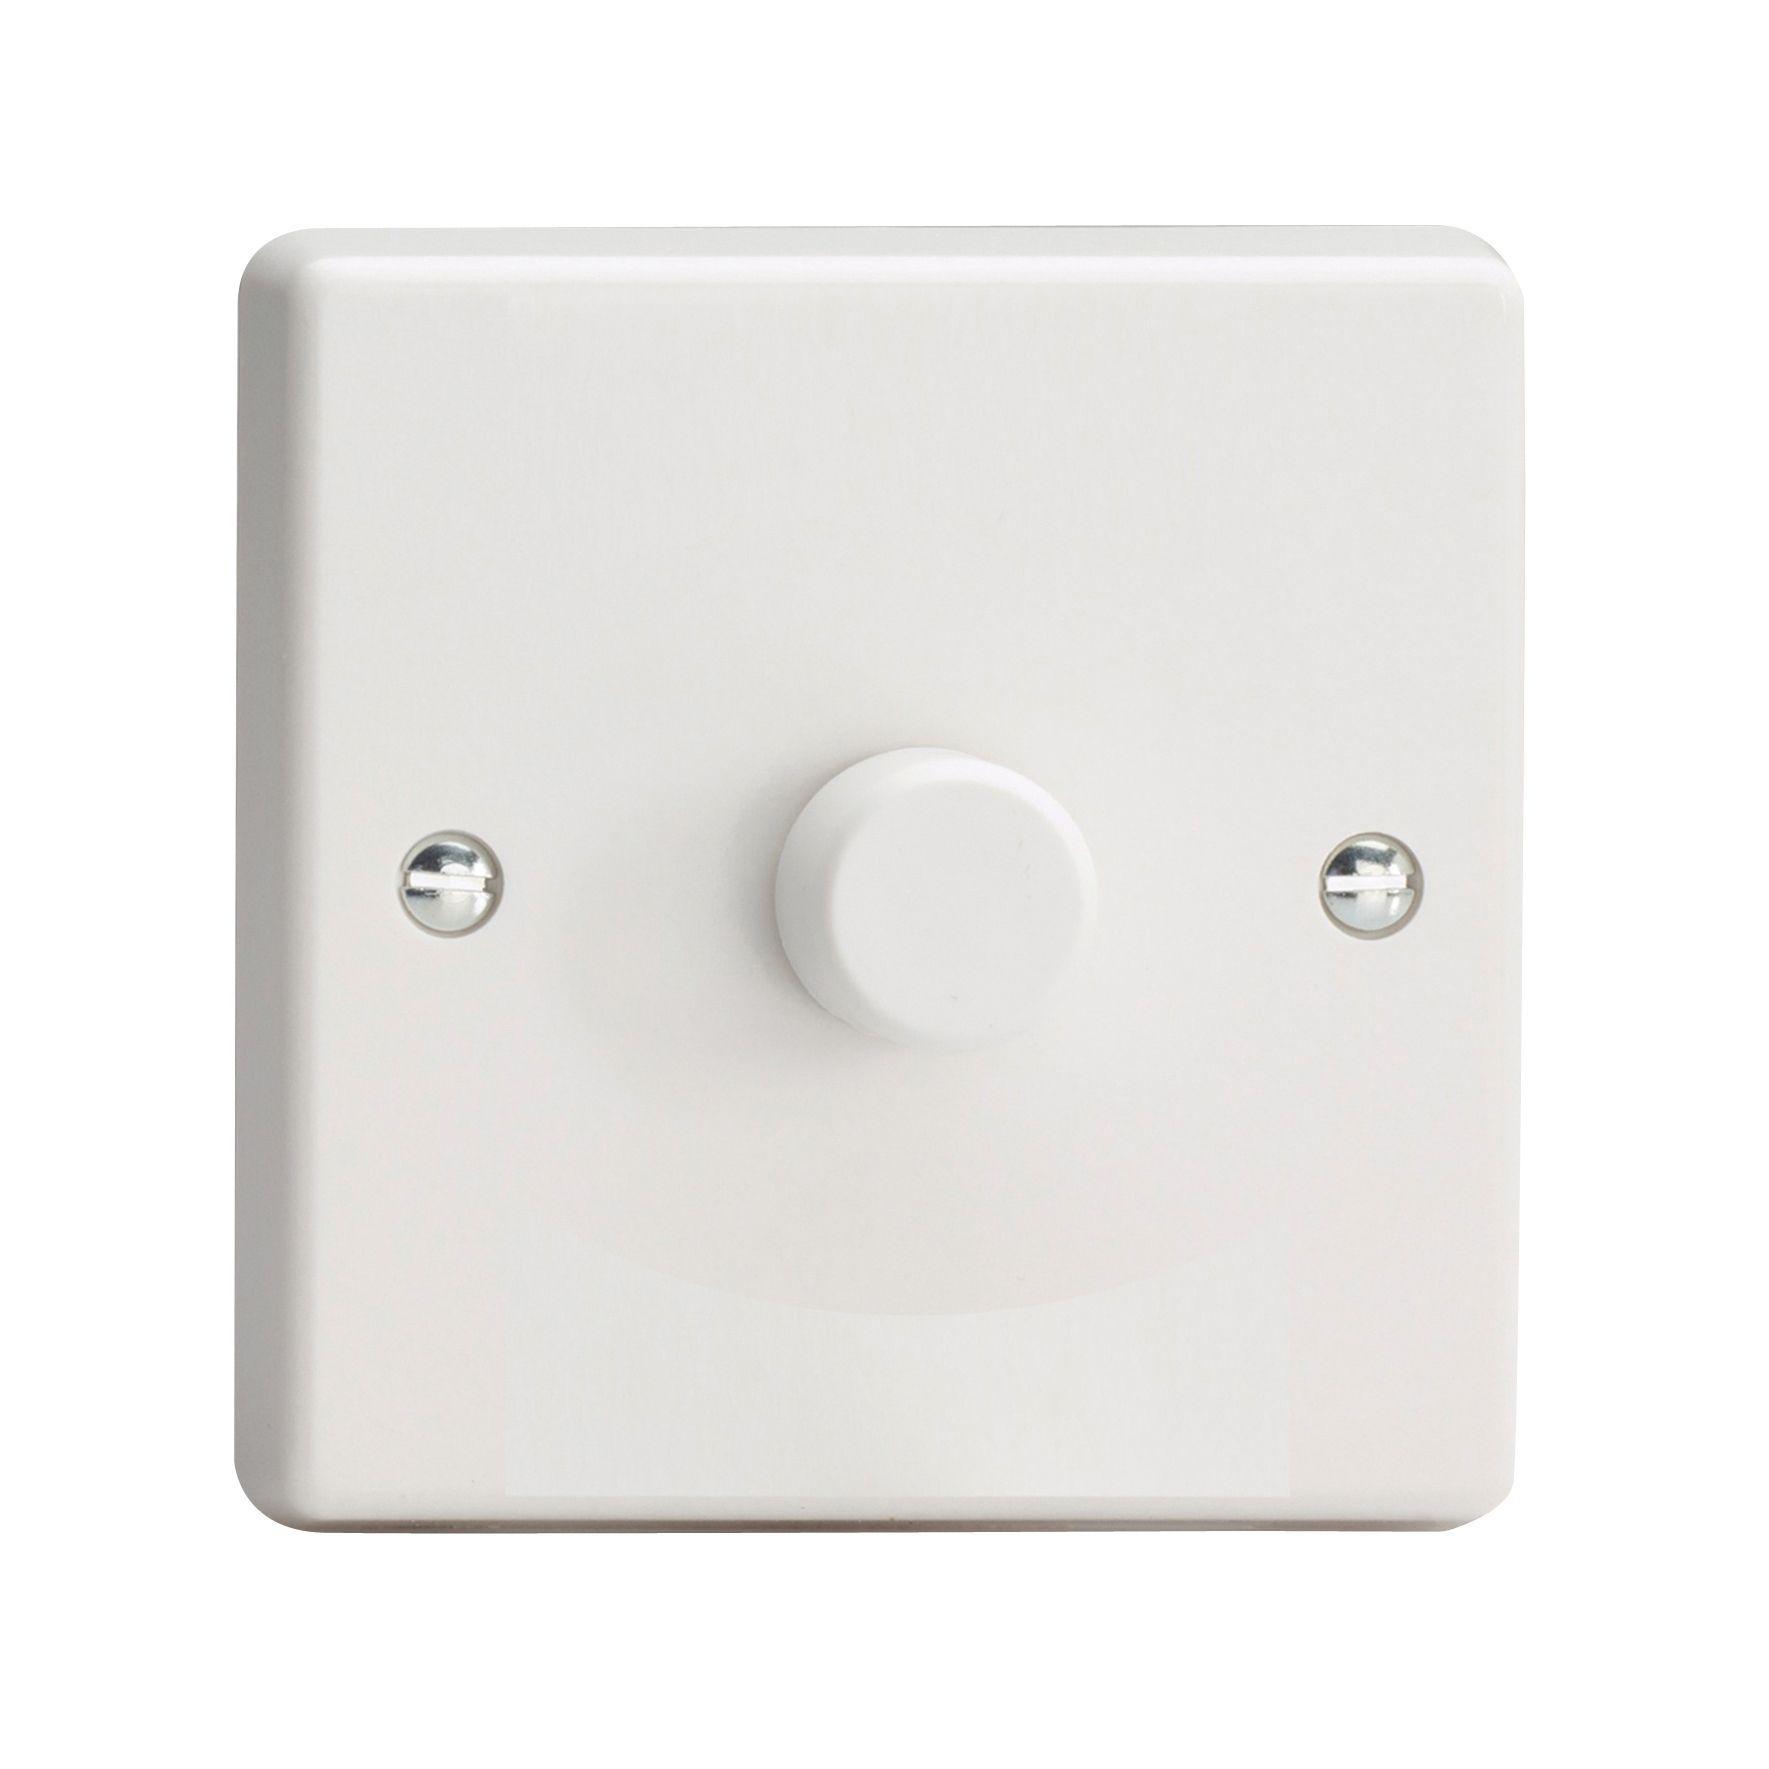 varilight v-com 2-way single white plastic led dimmer switch, Wiring diagram